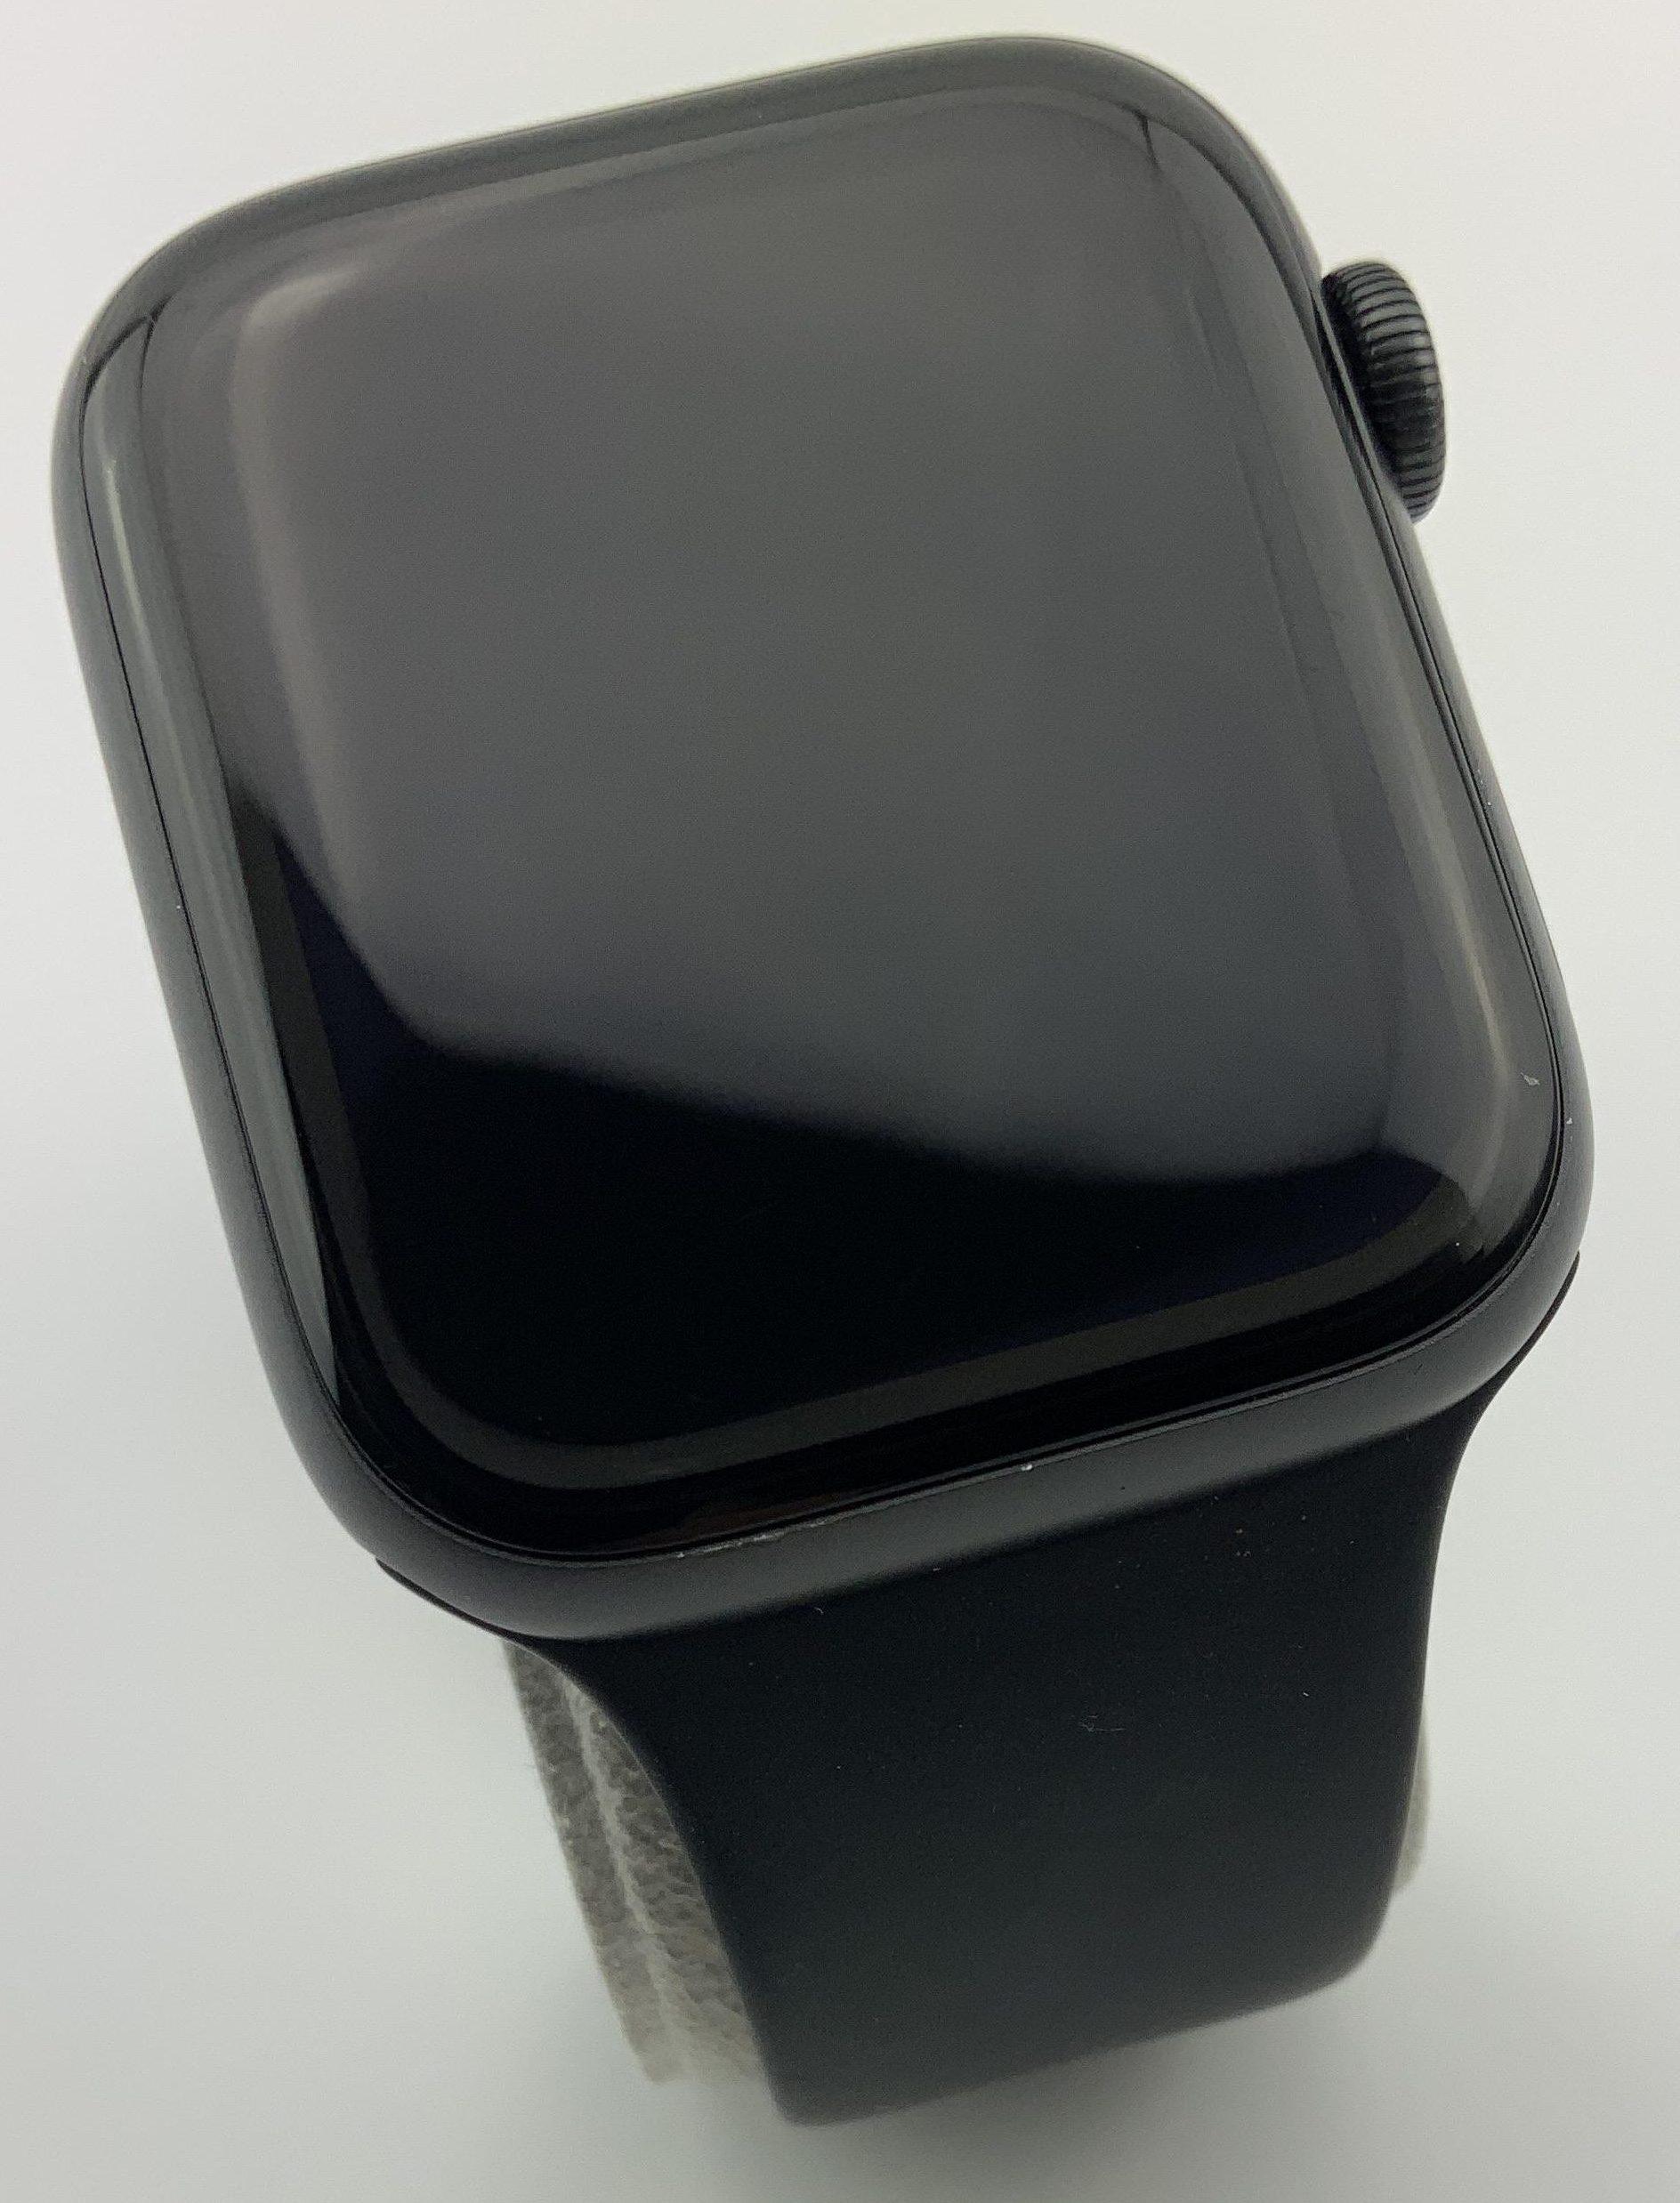 Watch Series 5 Aluminum Cellular (44mm), Space Gray, imagen 2